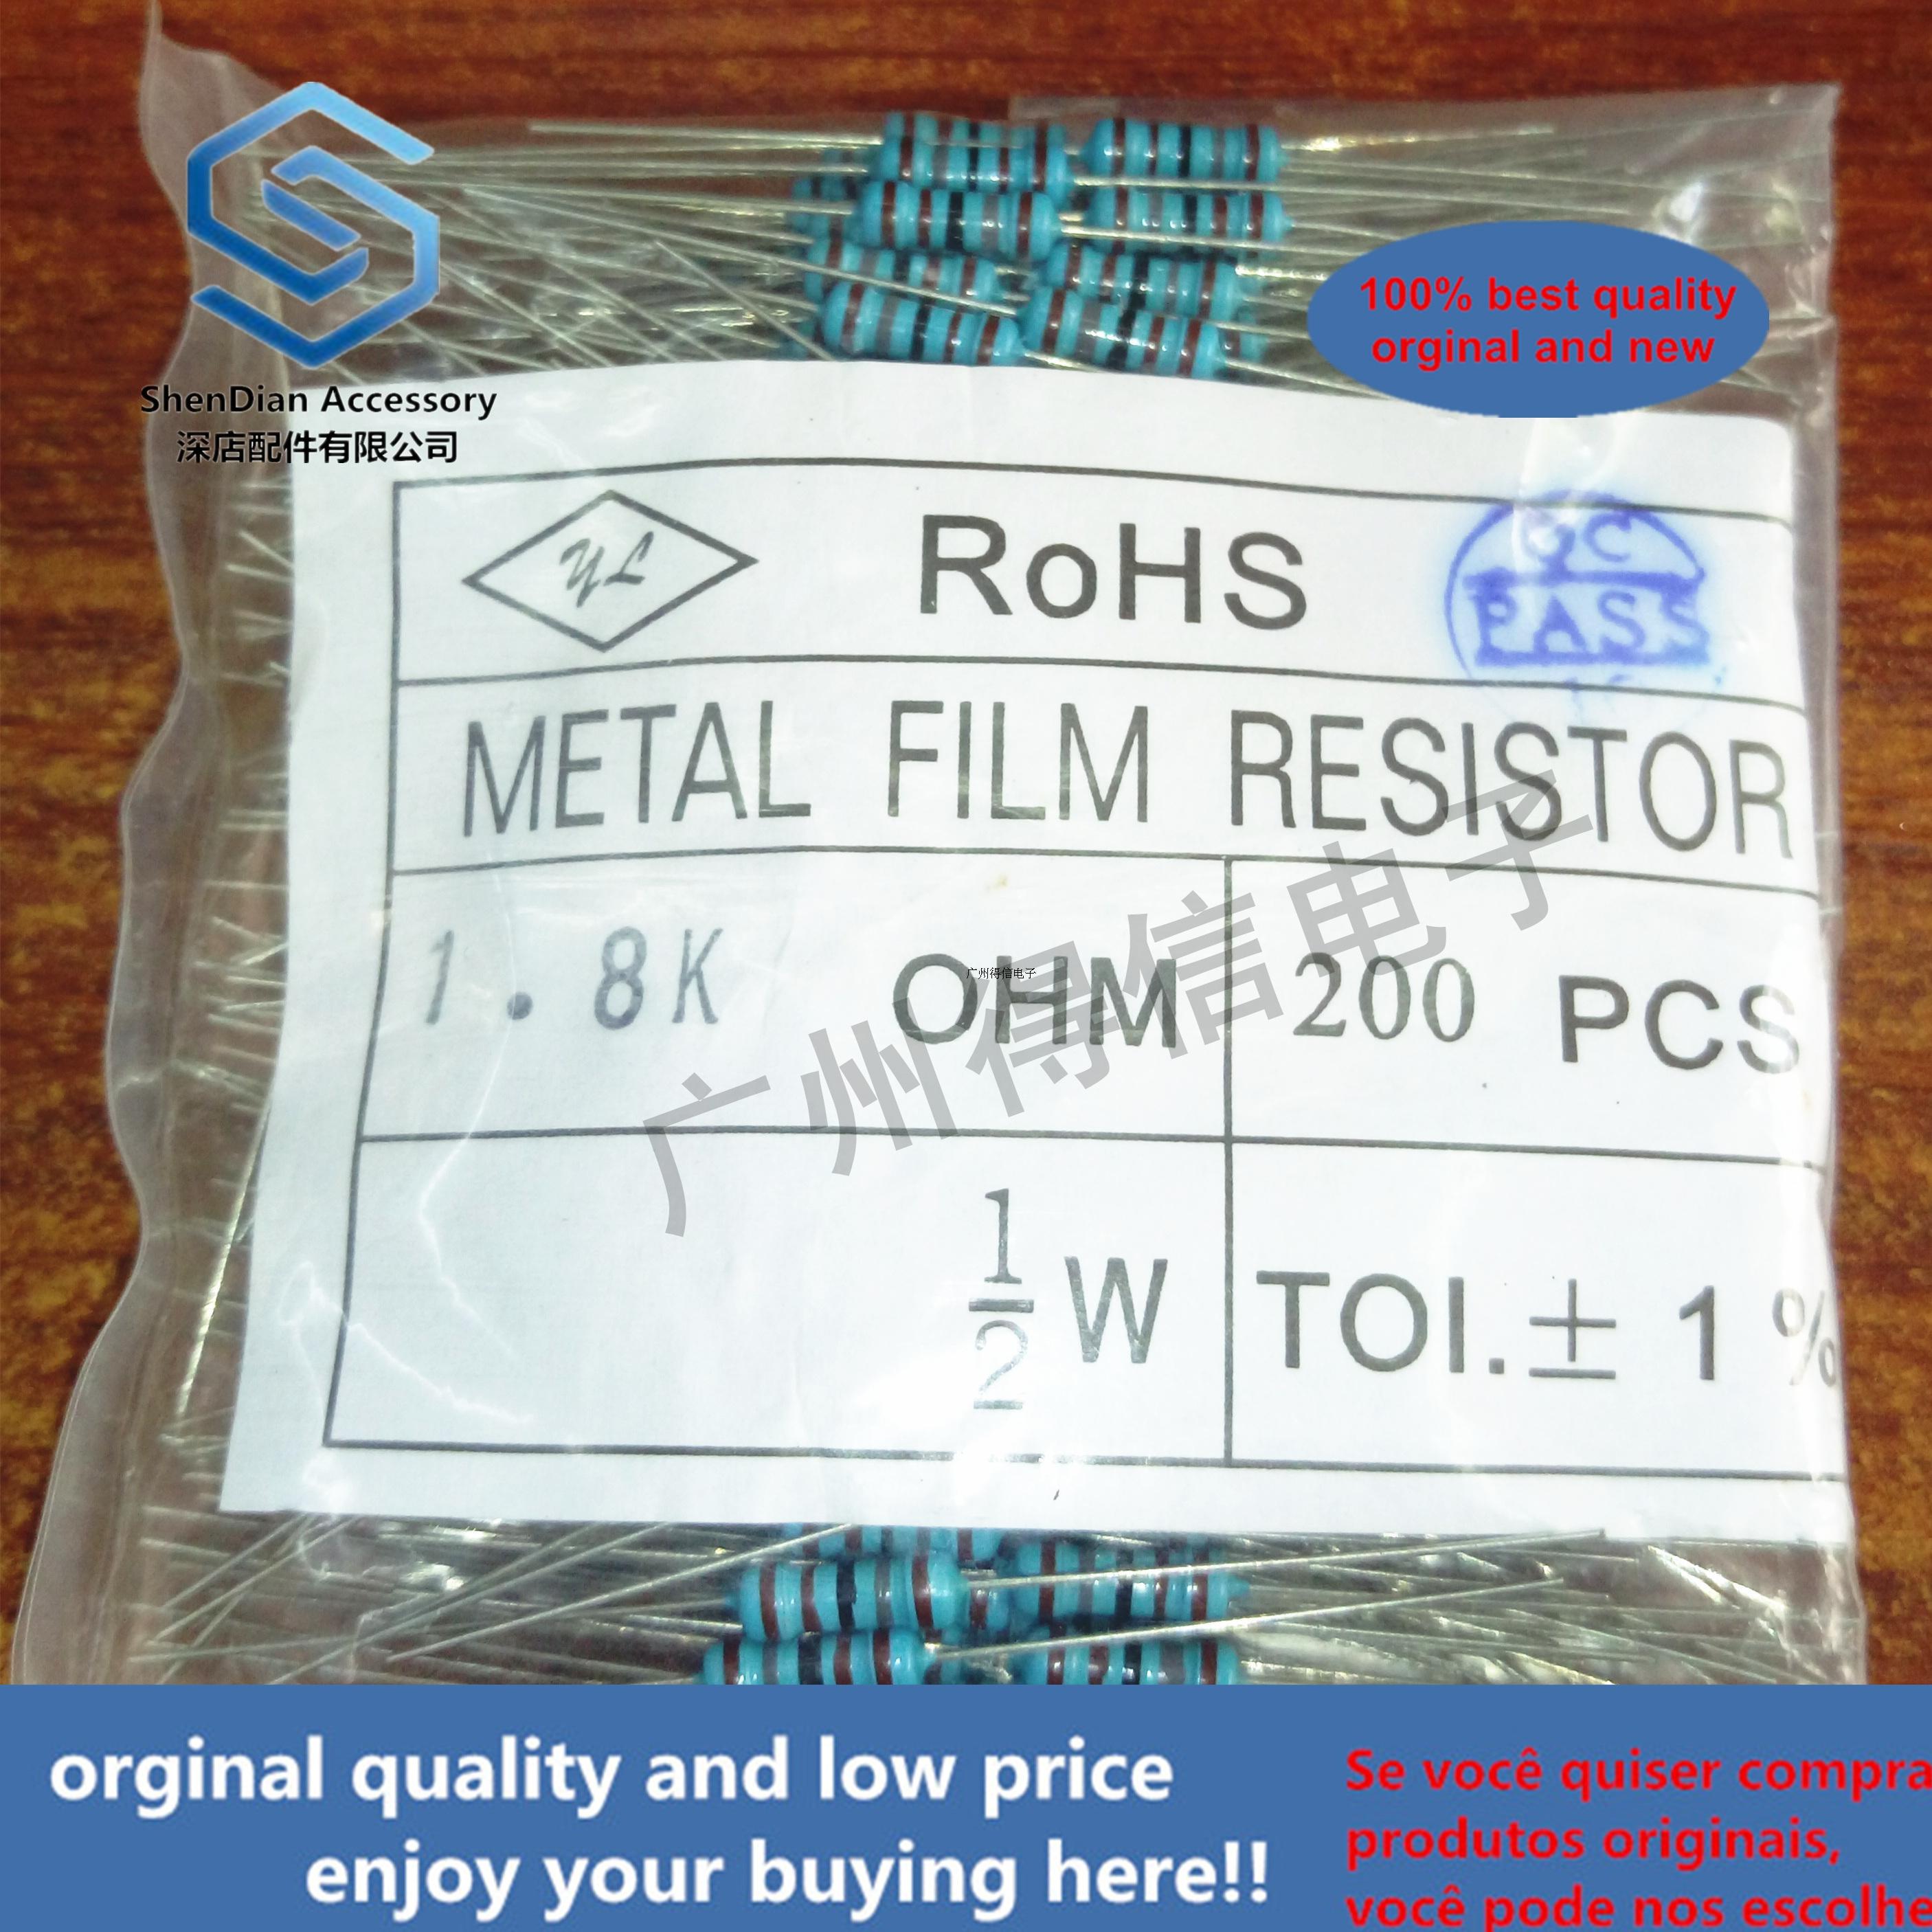 200pcs 1 / 2W 2.7R 2.7 Euro 1% Brand New Metal Film Iron Feet Resistor Bag 200 Pcs Per Pack